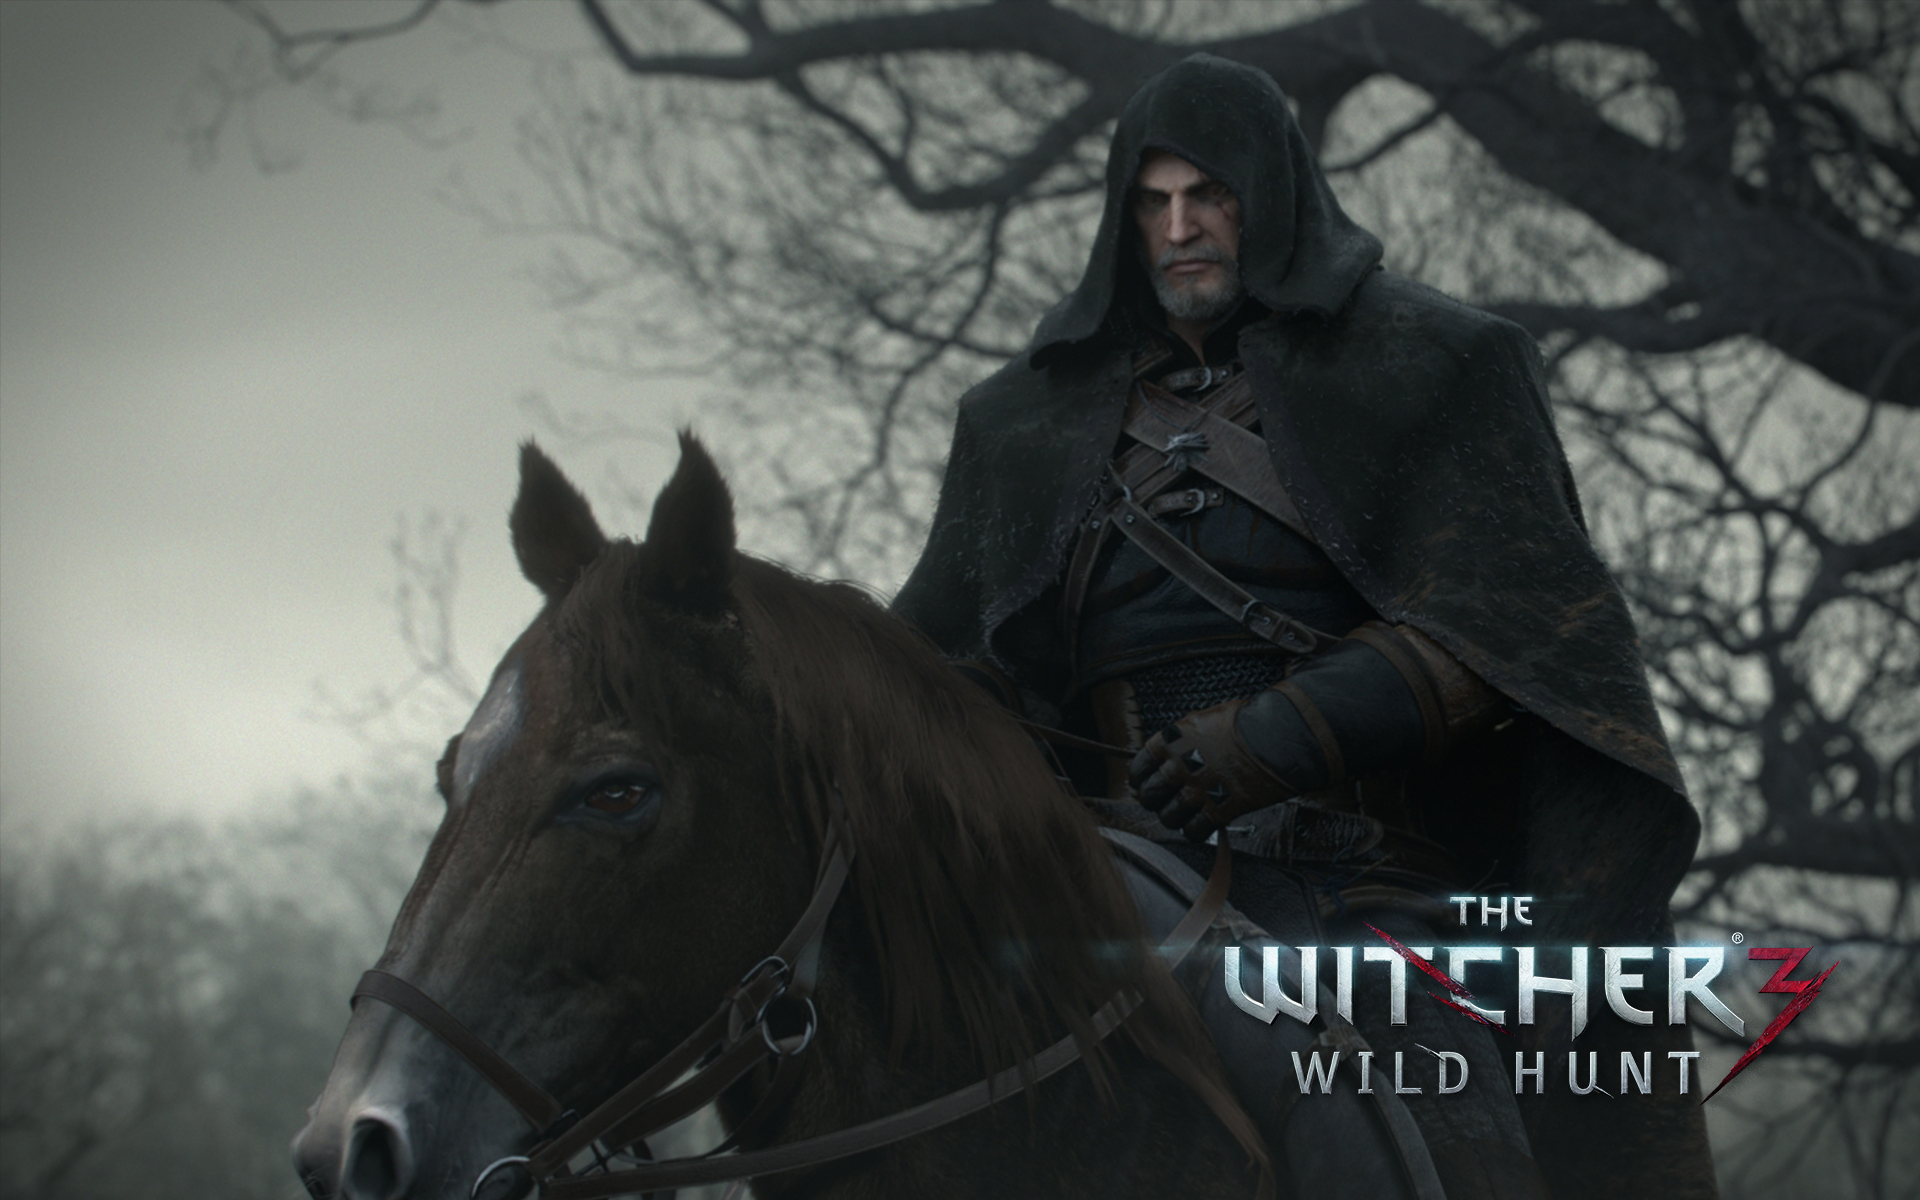 The Witcher 3: Wild Hunt + Trailer